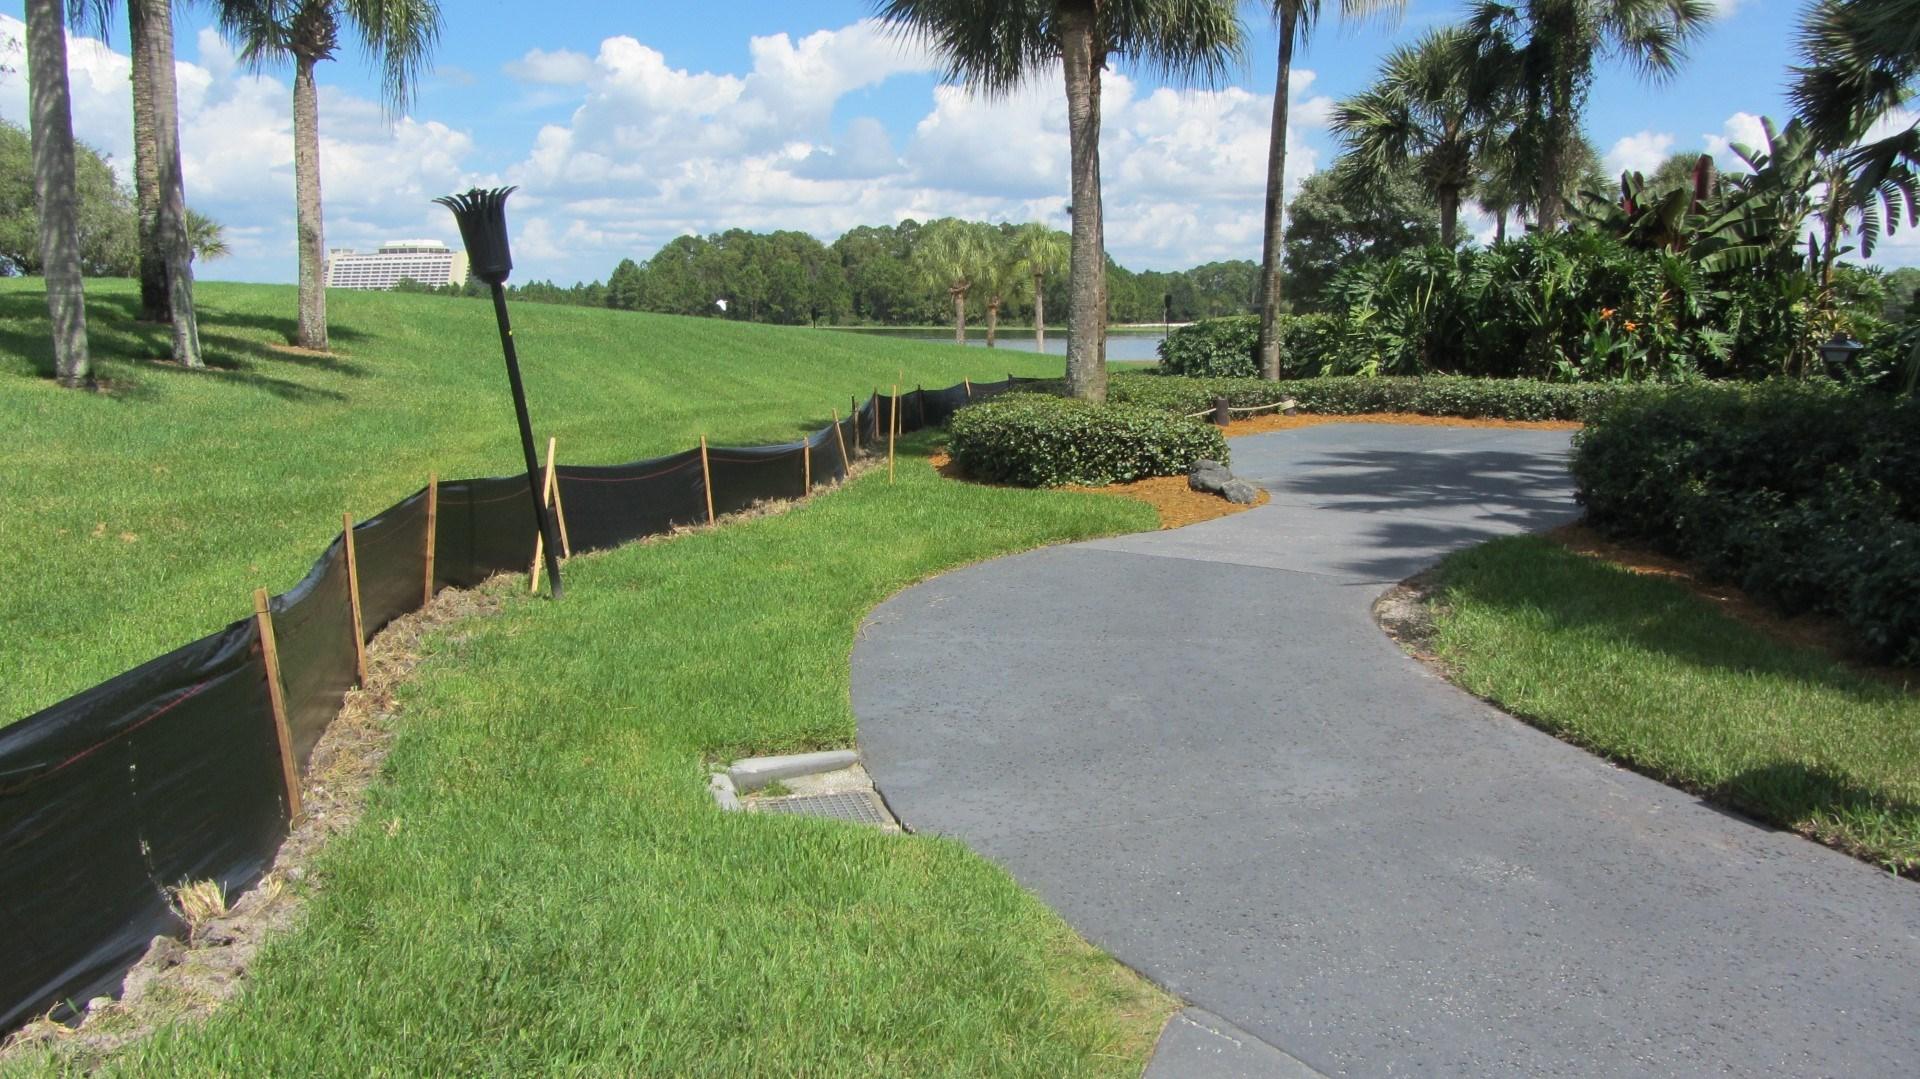 Early signs of DVC villas site preparation at Disney's Polynesian Resort